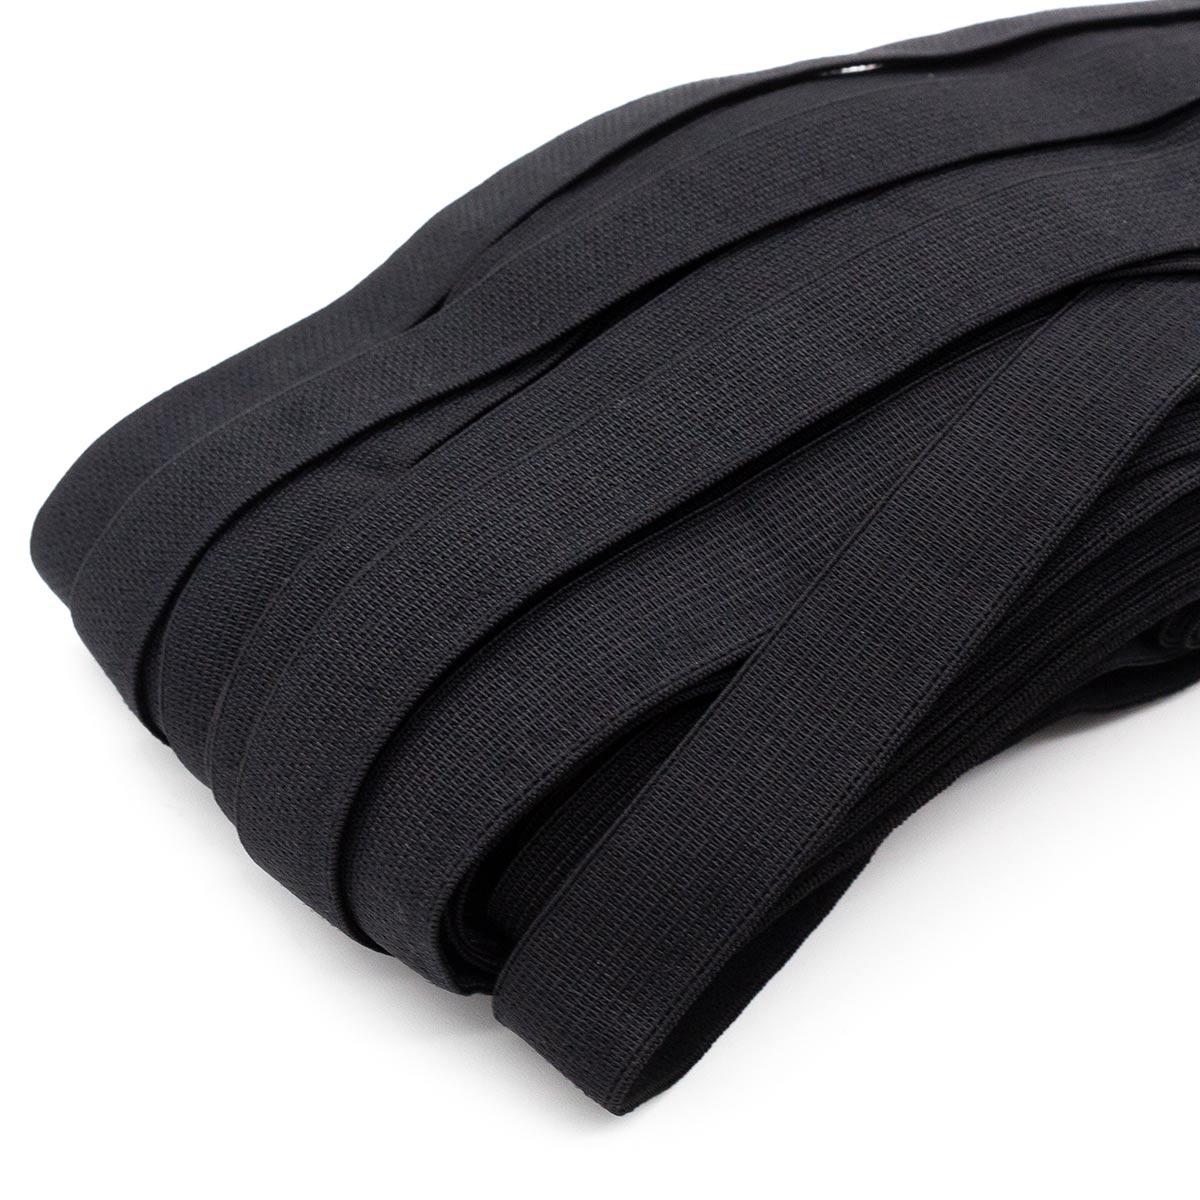 STB/15 эластичная отделочная лента 14мм*25м, черный